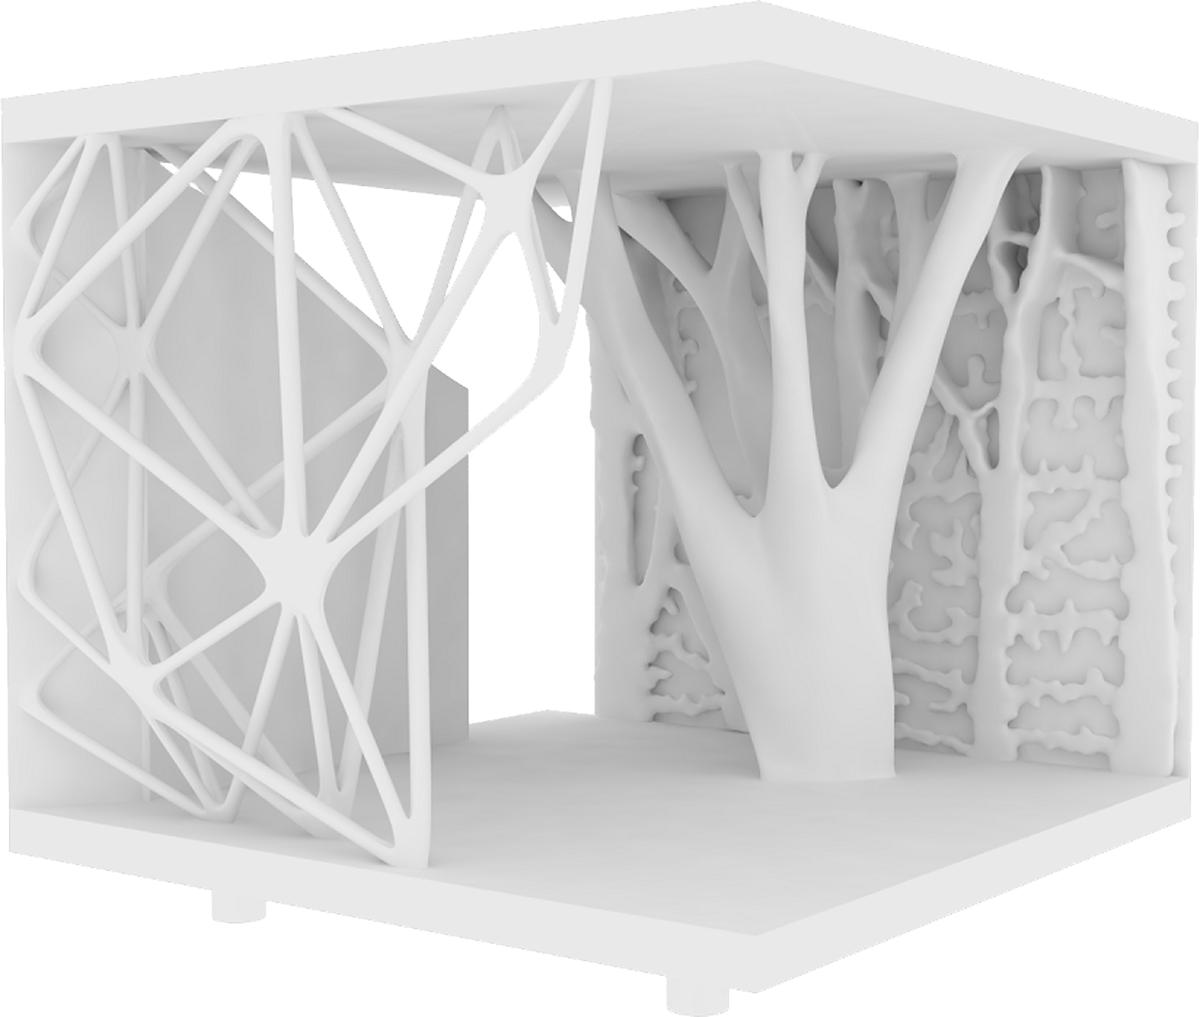 maquette 3D architecture